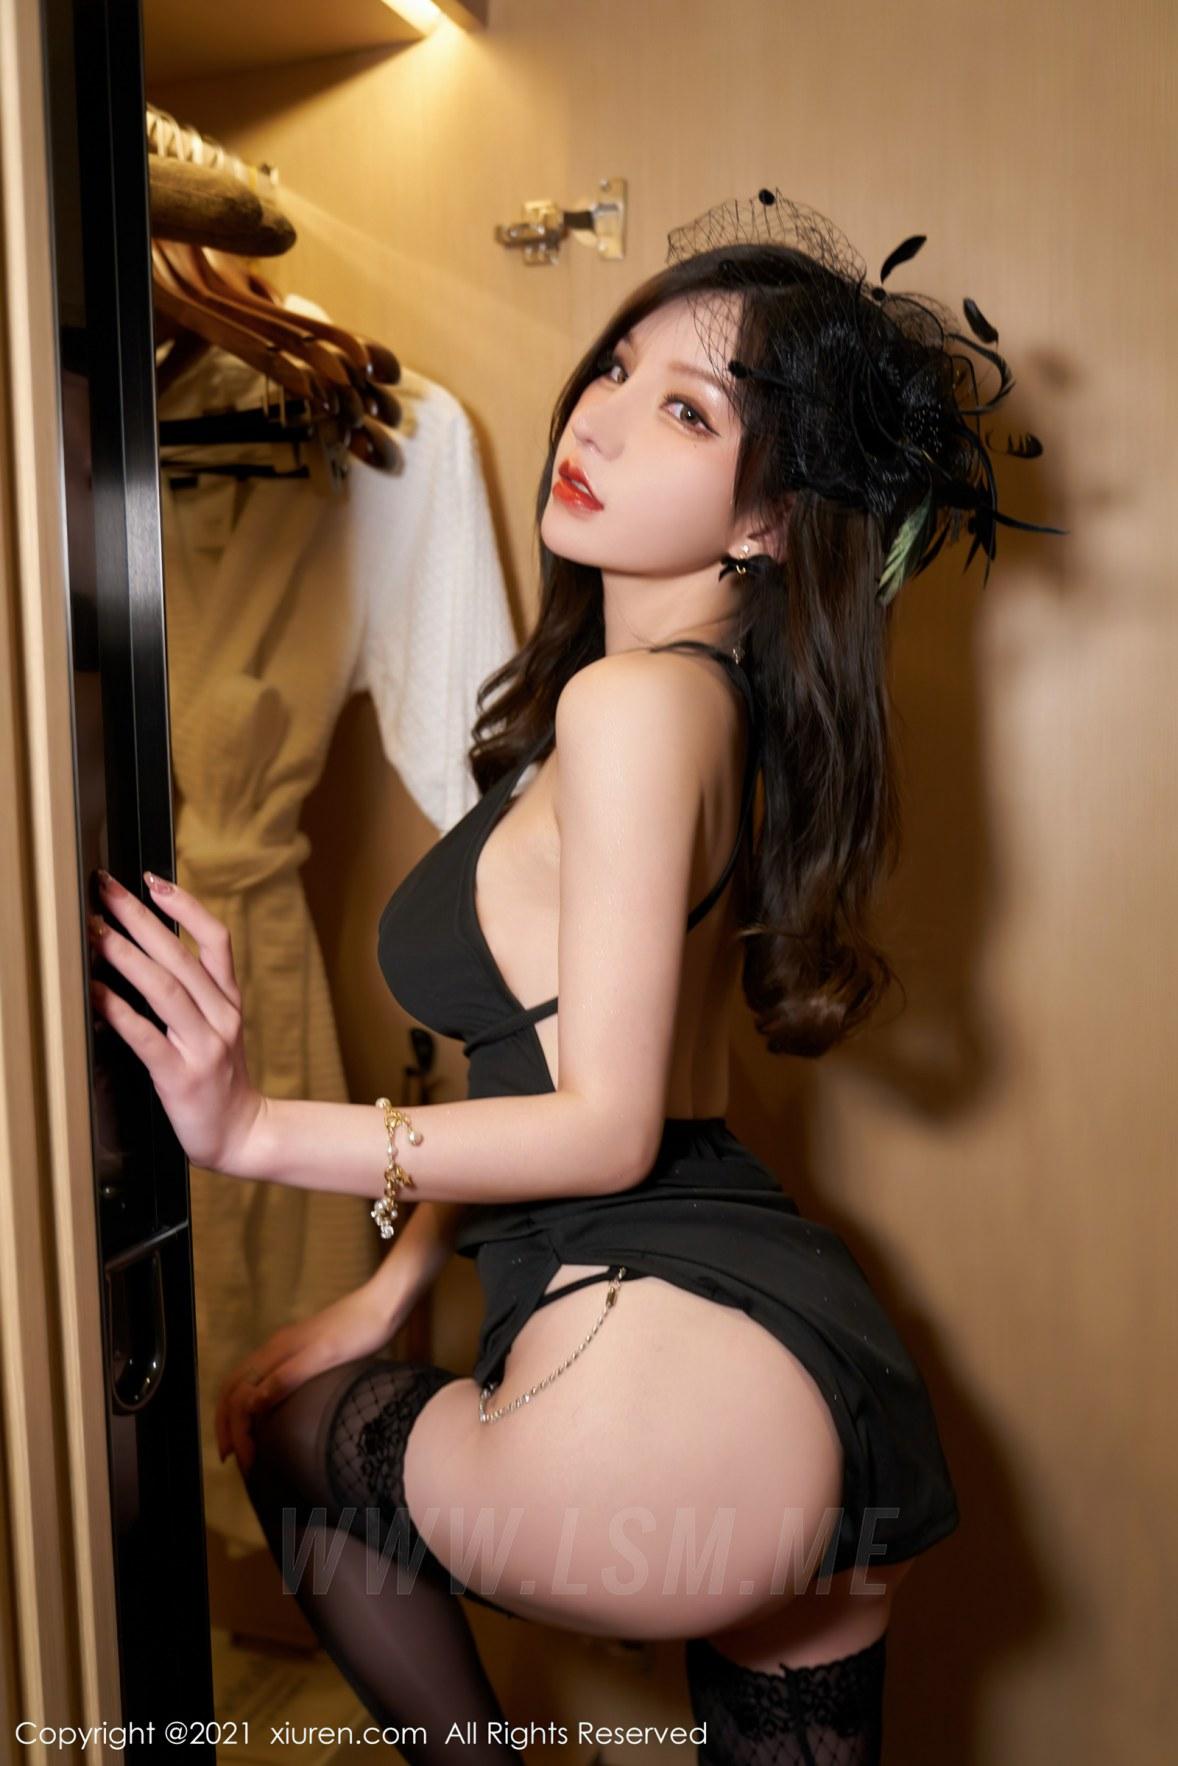 3584 023 rd1 3603 5400 - XiuRen 秀人 No.3584 吊裙服饰 周于希Sandy 性感写真2 - 秀人网 -【免费在线写真】【丽人丝语】